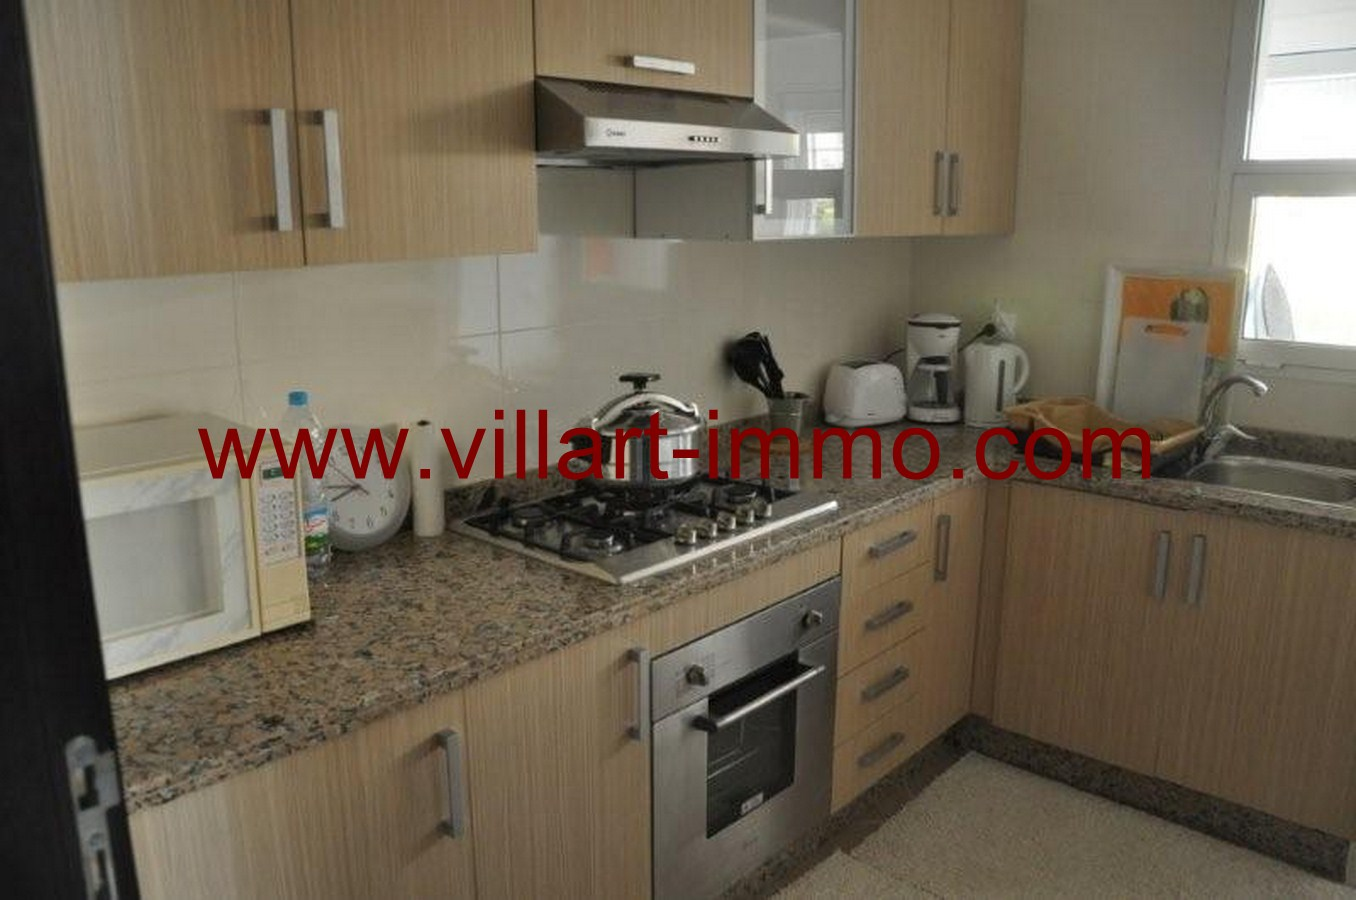 Location Appartement Meubl Tanger Route De Rabat Villart